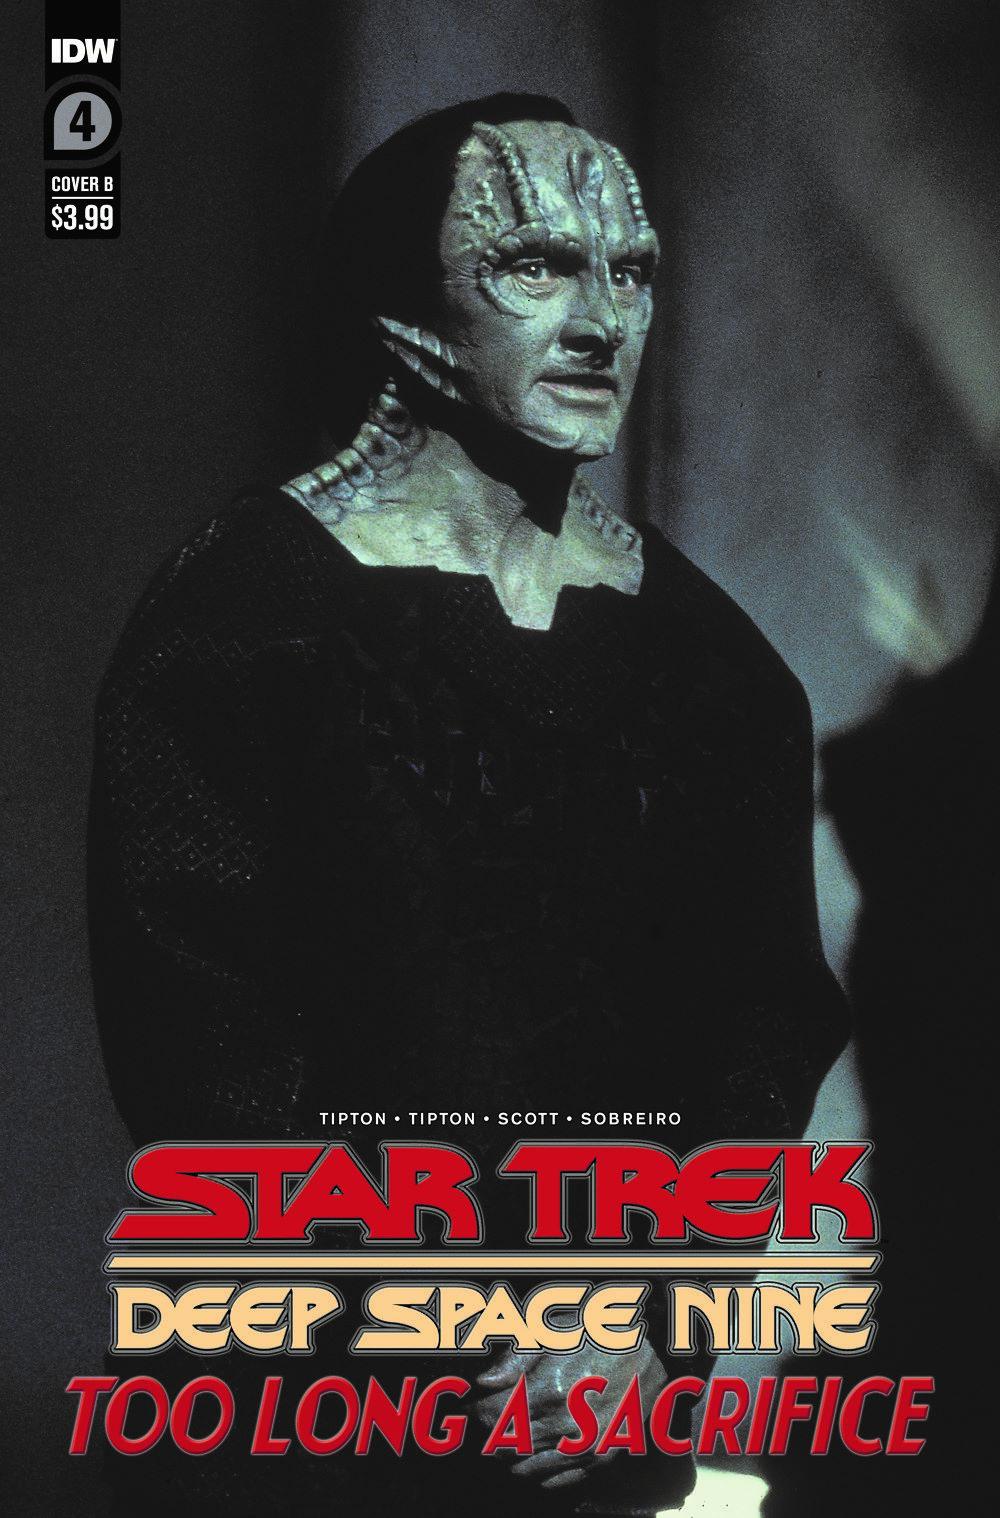 ST_DS9-TLAS04-coverB ComicList Previews: STAR TREK DEEP SPACE NINE TOO LONG A SACRIFICE #4 (OF 4)